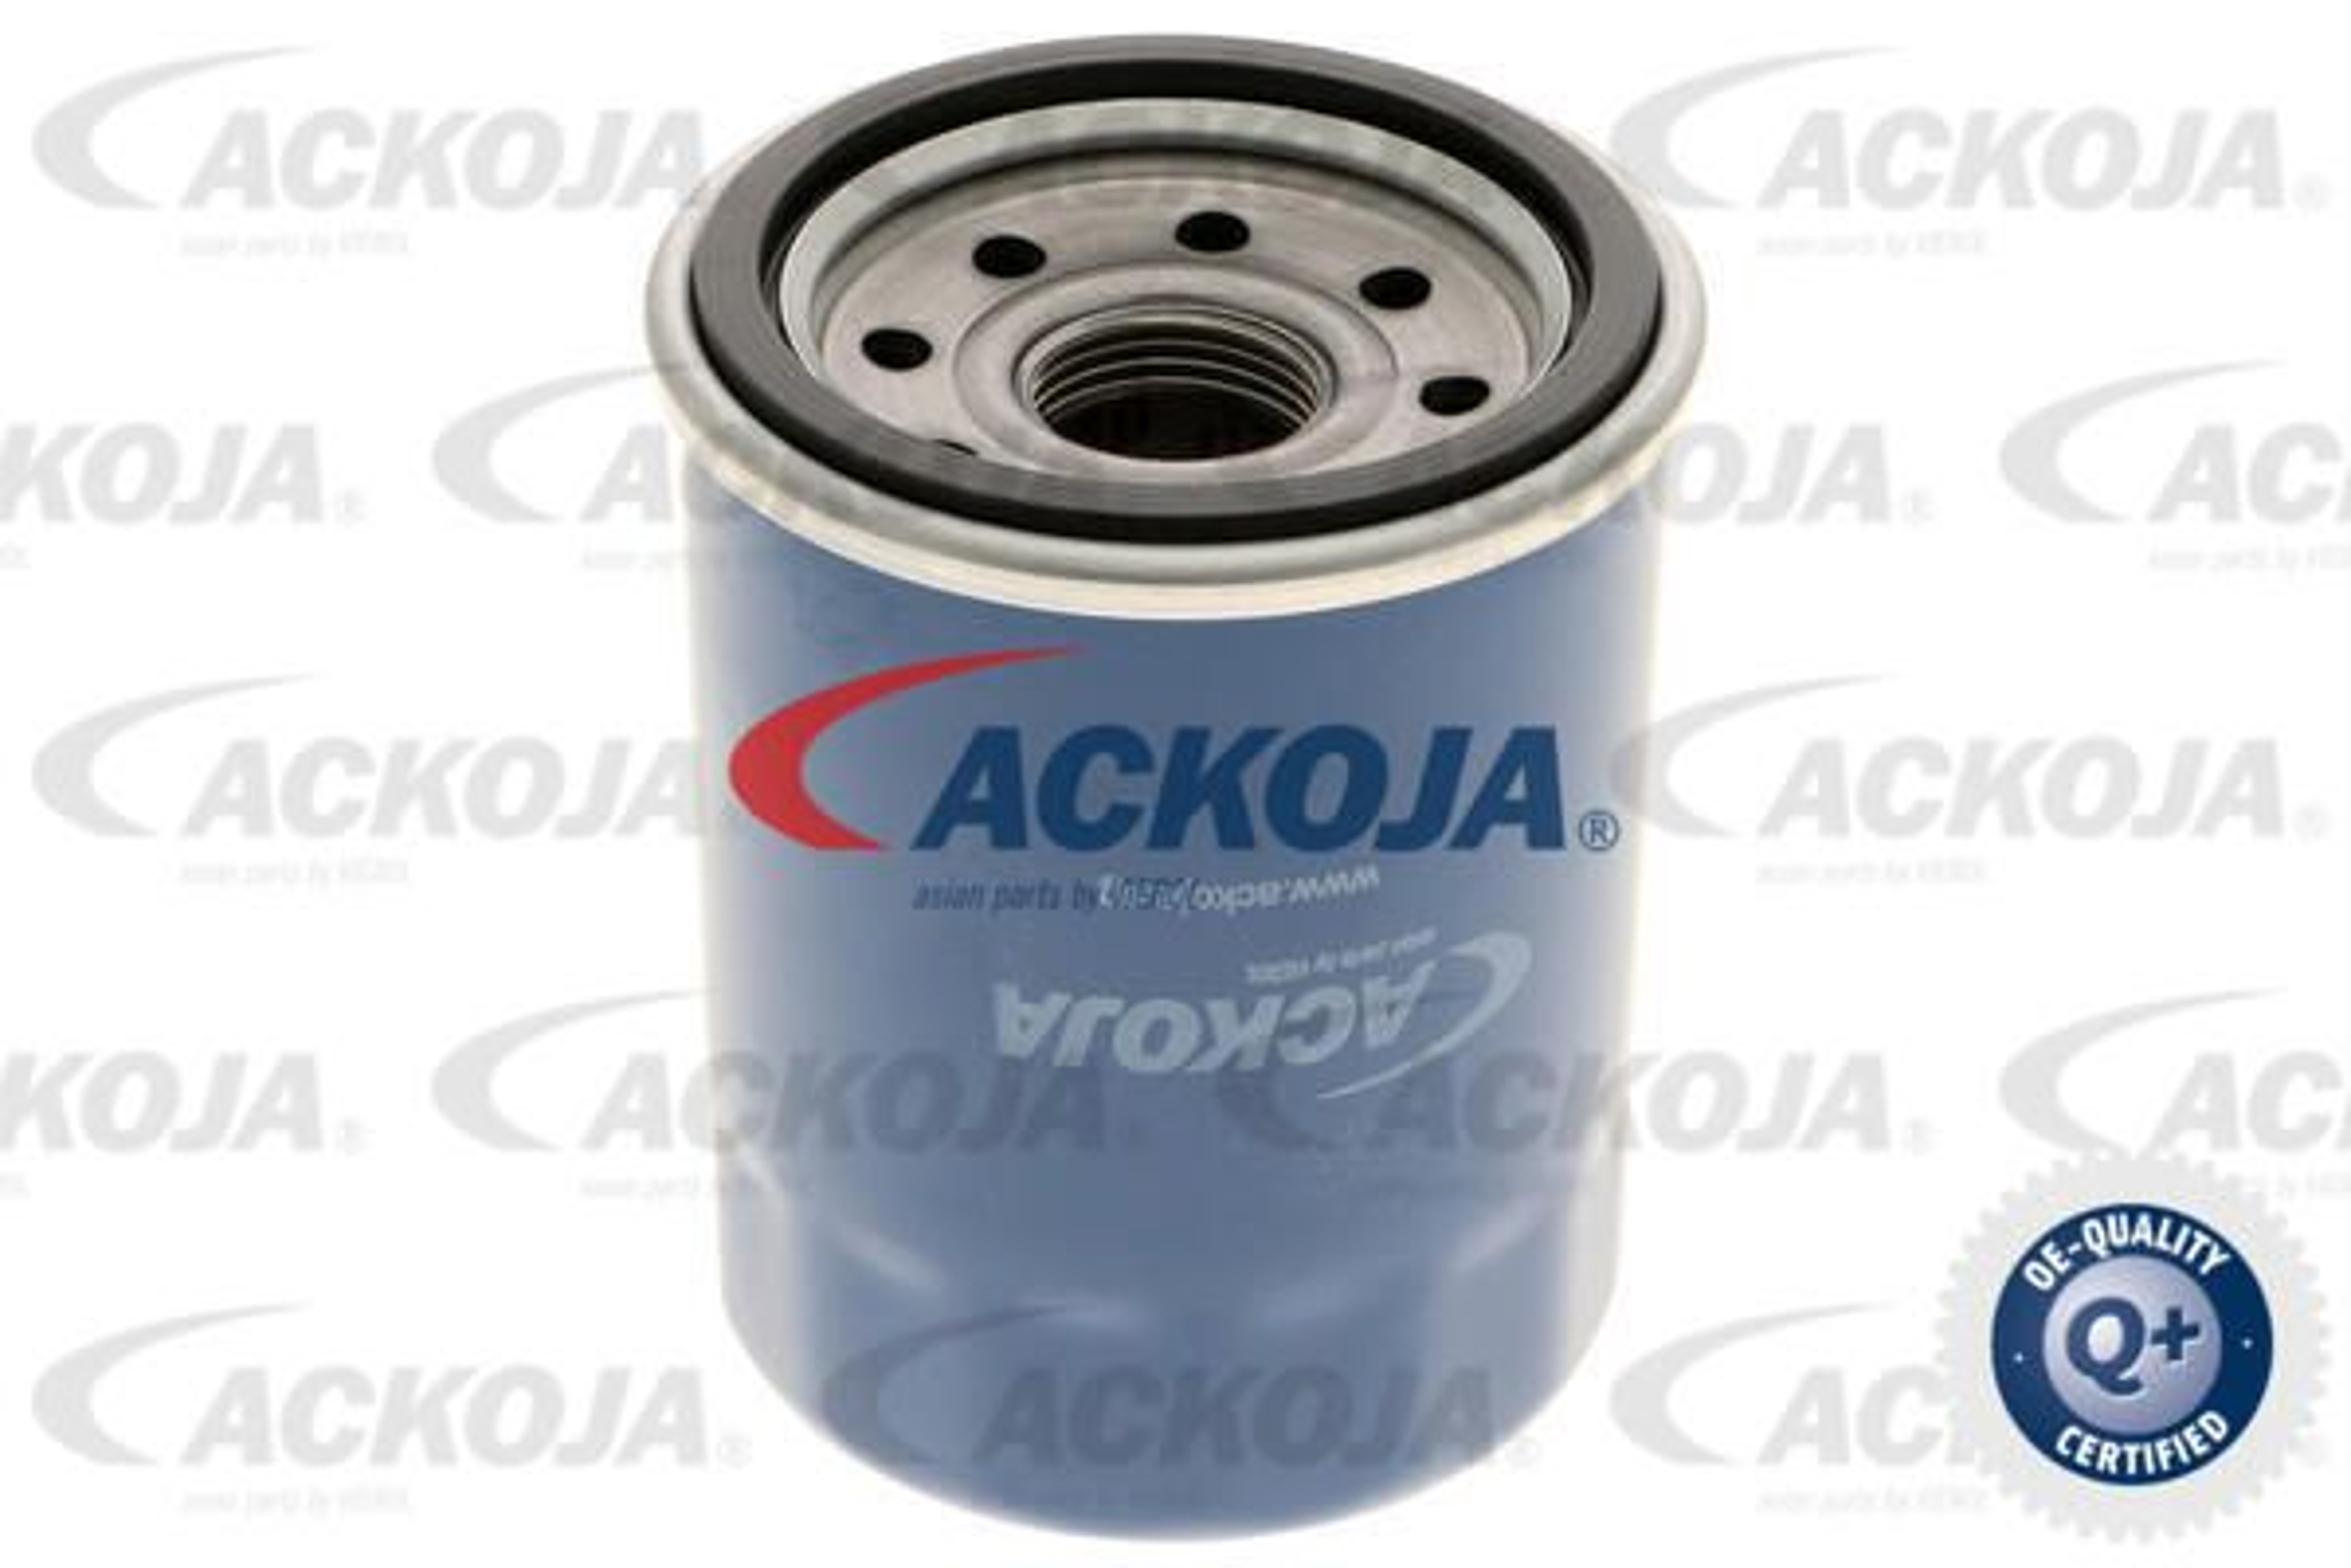 A26-0500 ACKOJA Screw-on Filter Oil Filter A26-0500 cheap